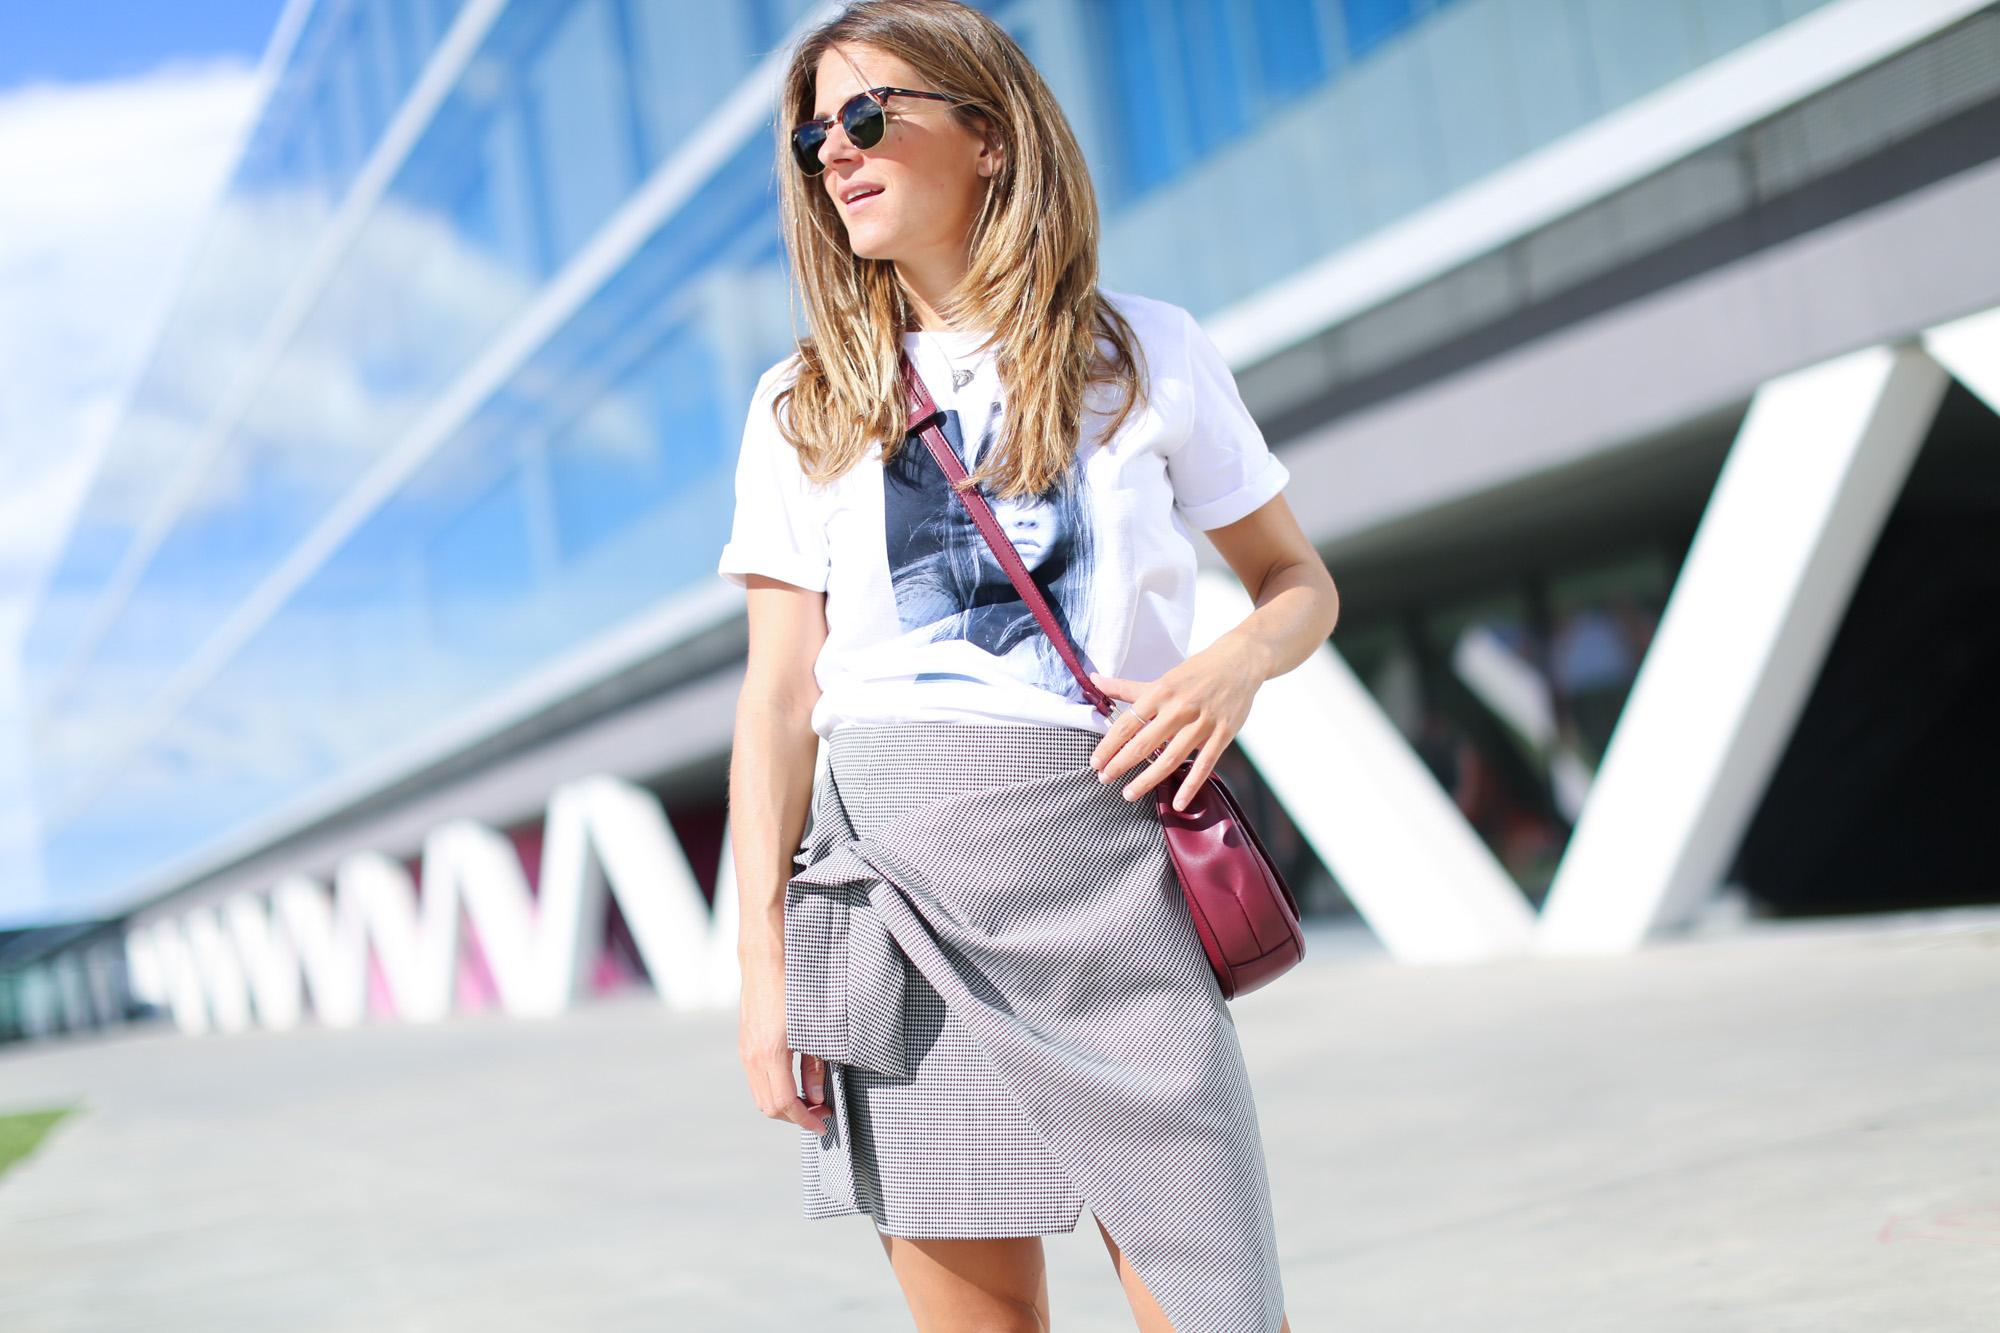 clochet_streetstyle_fashionblogger_leatherloafers_zara_asymmetric_toothgooseminiskirt-3